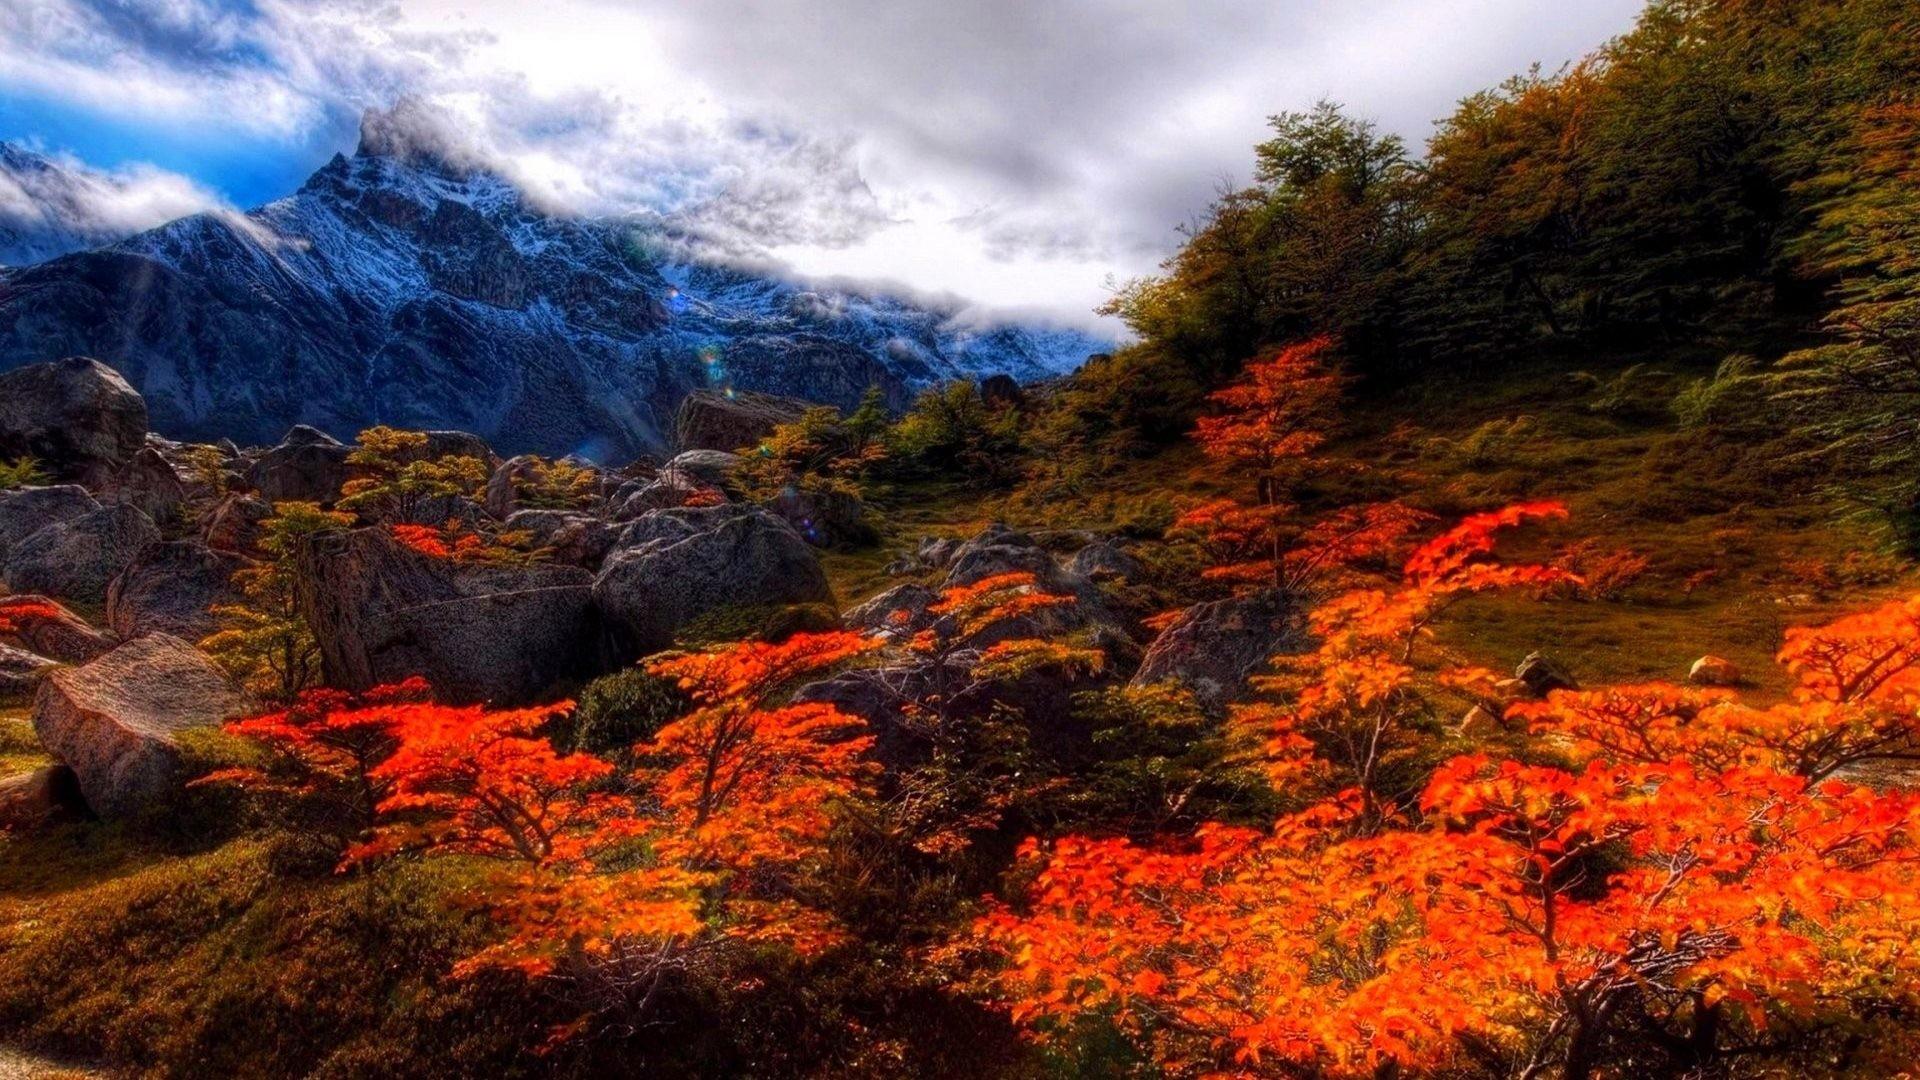 Leaves – Fall Forest Landscape Leaf Autumn Nature Season Leaves Tree  Seasons Color Desktop Wallpaper Scenes